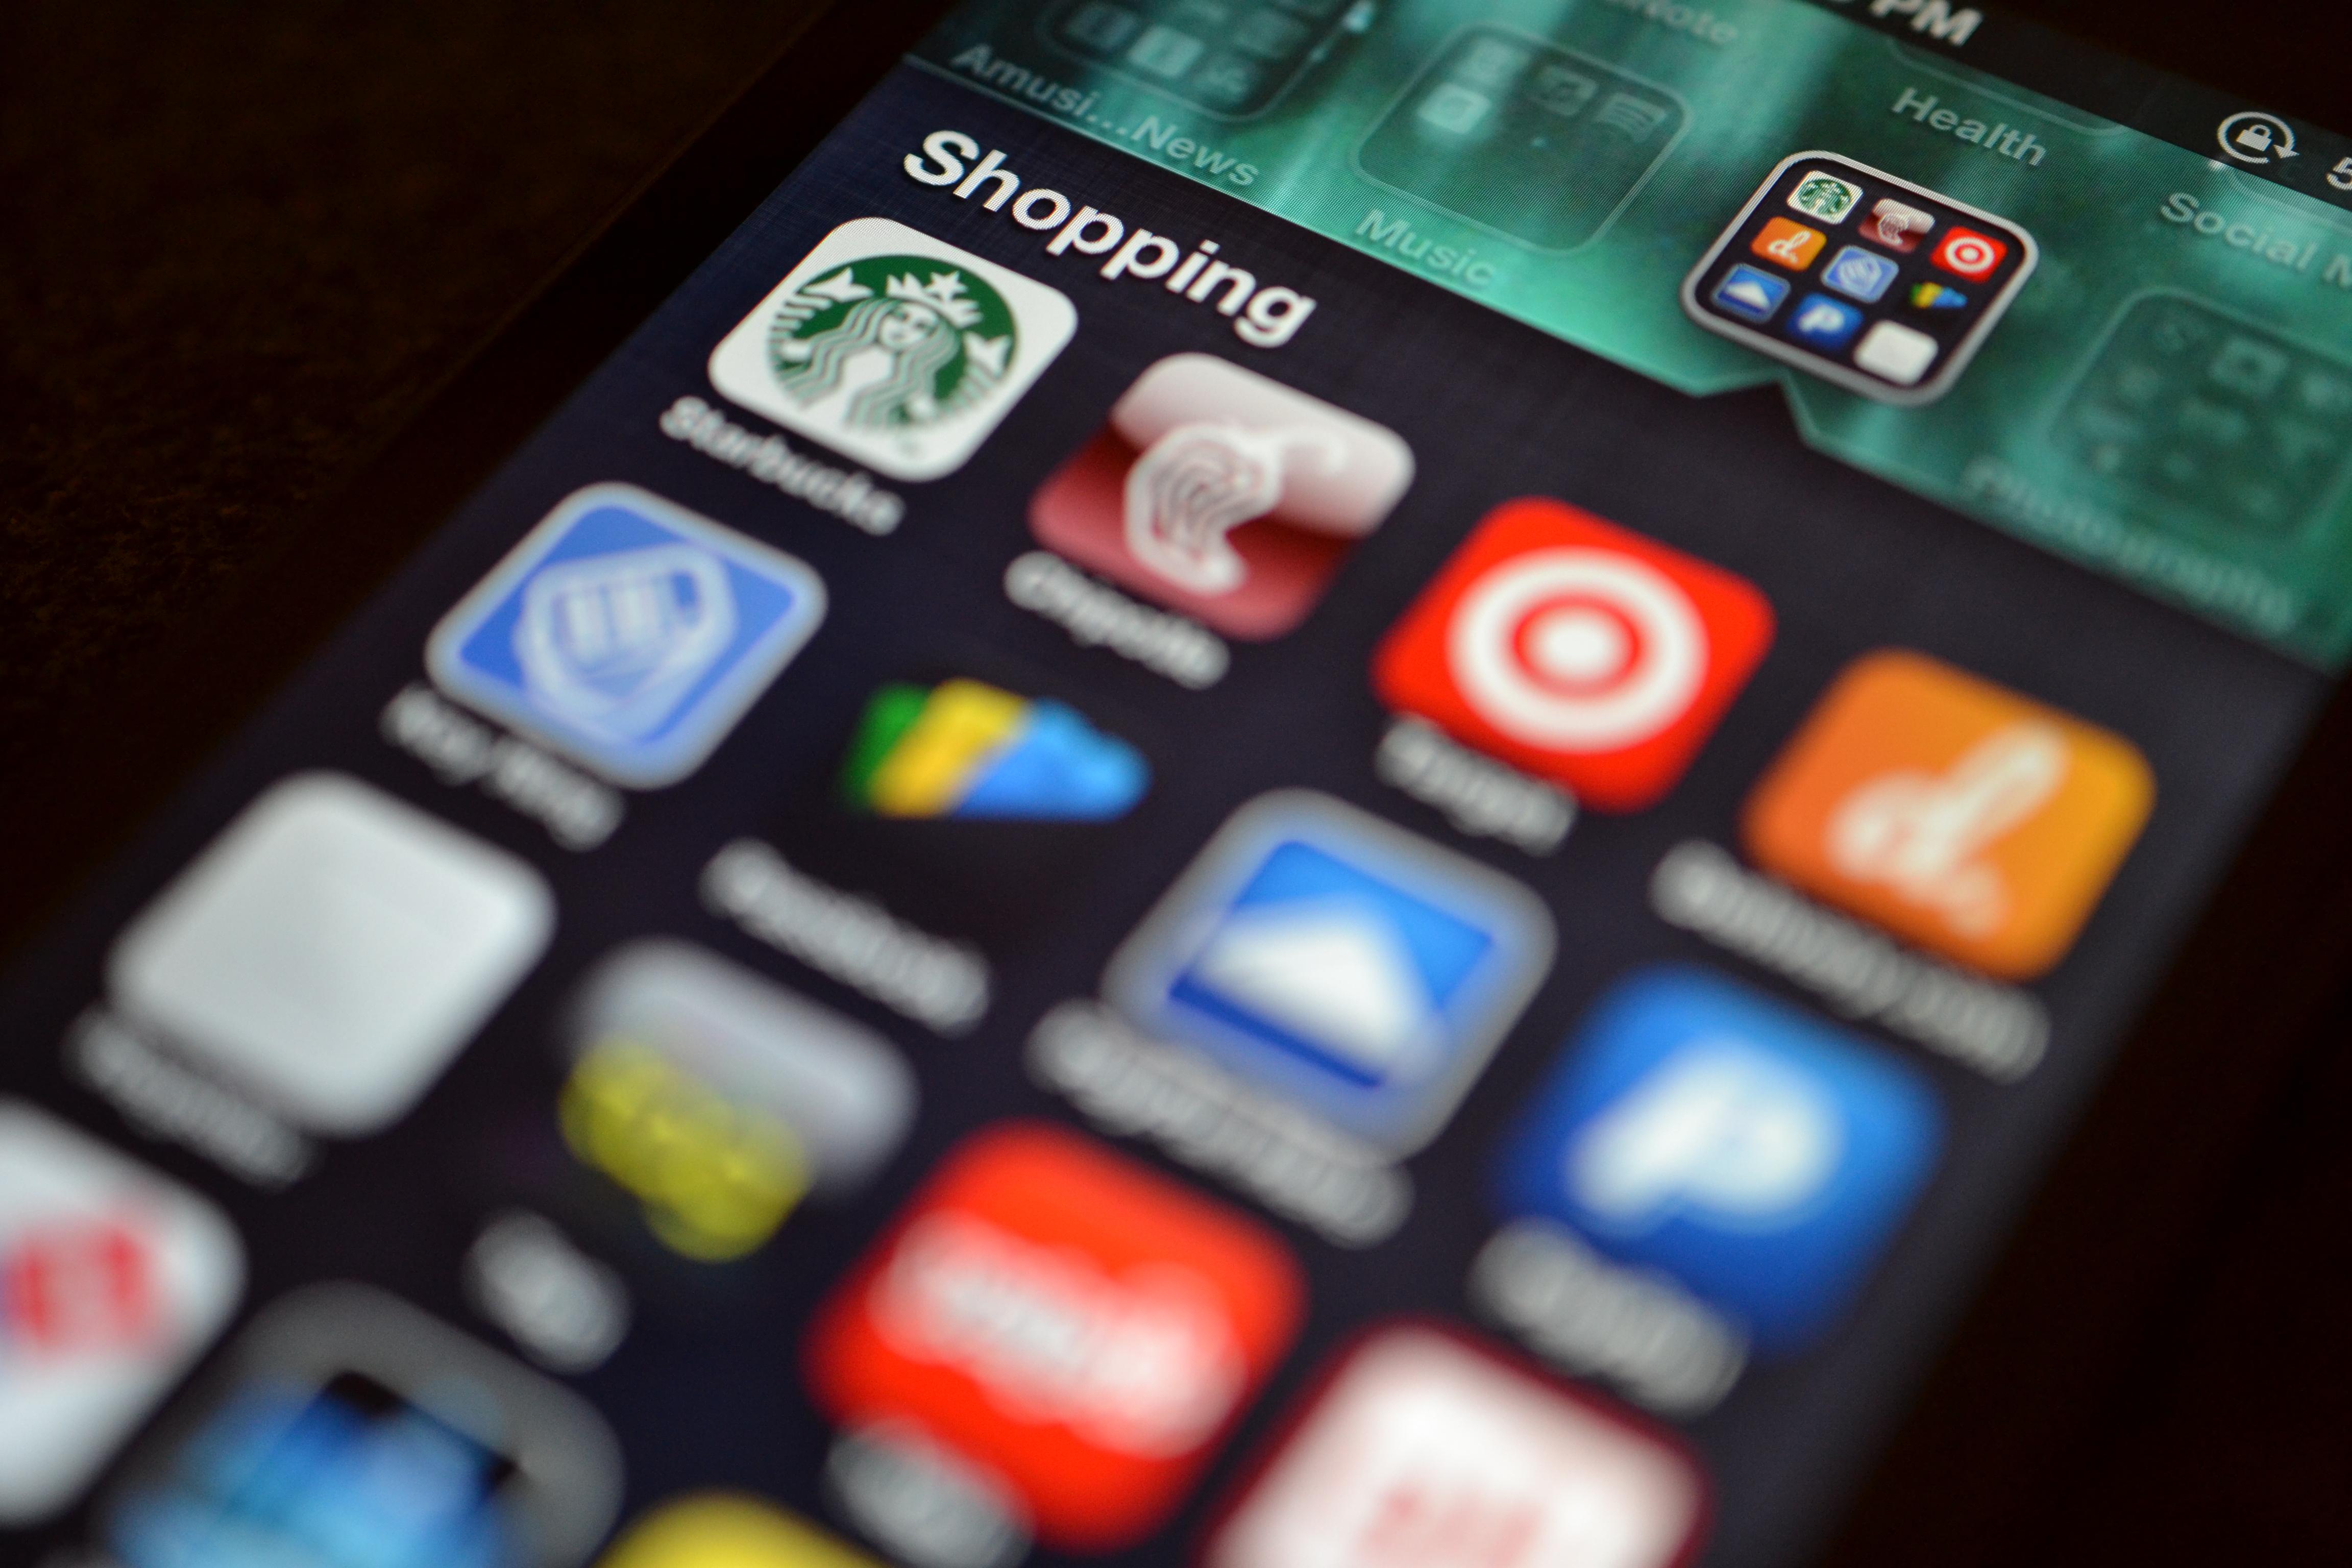 Budgens trailblazes new app